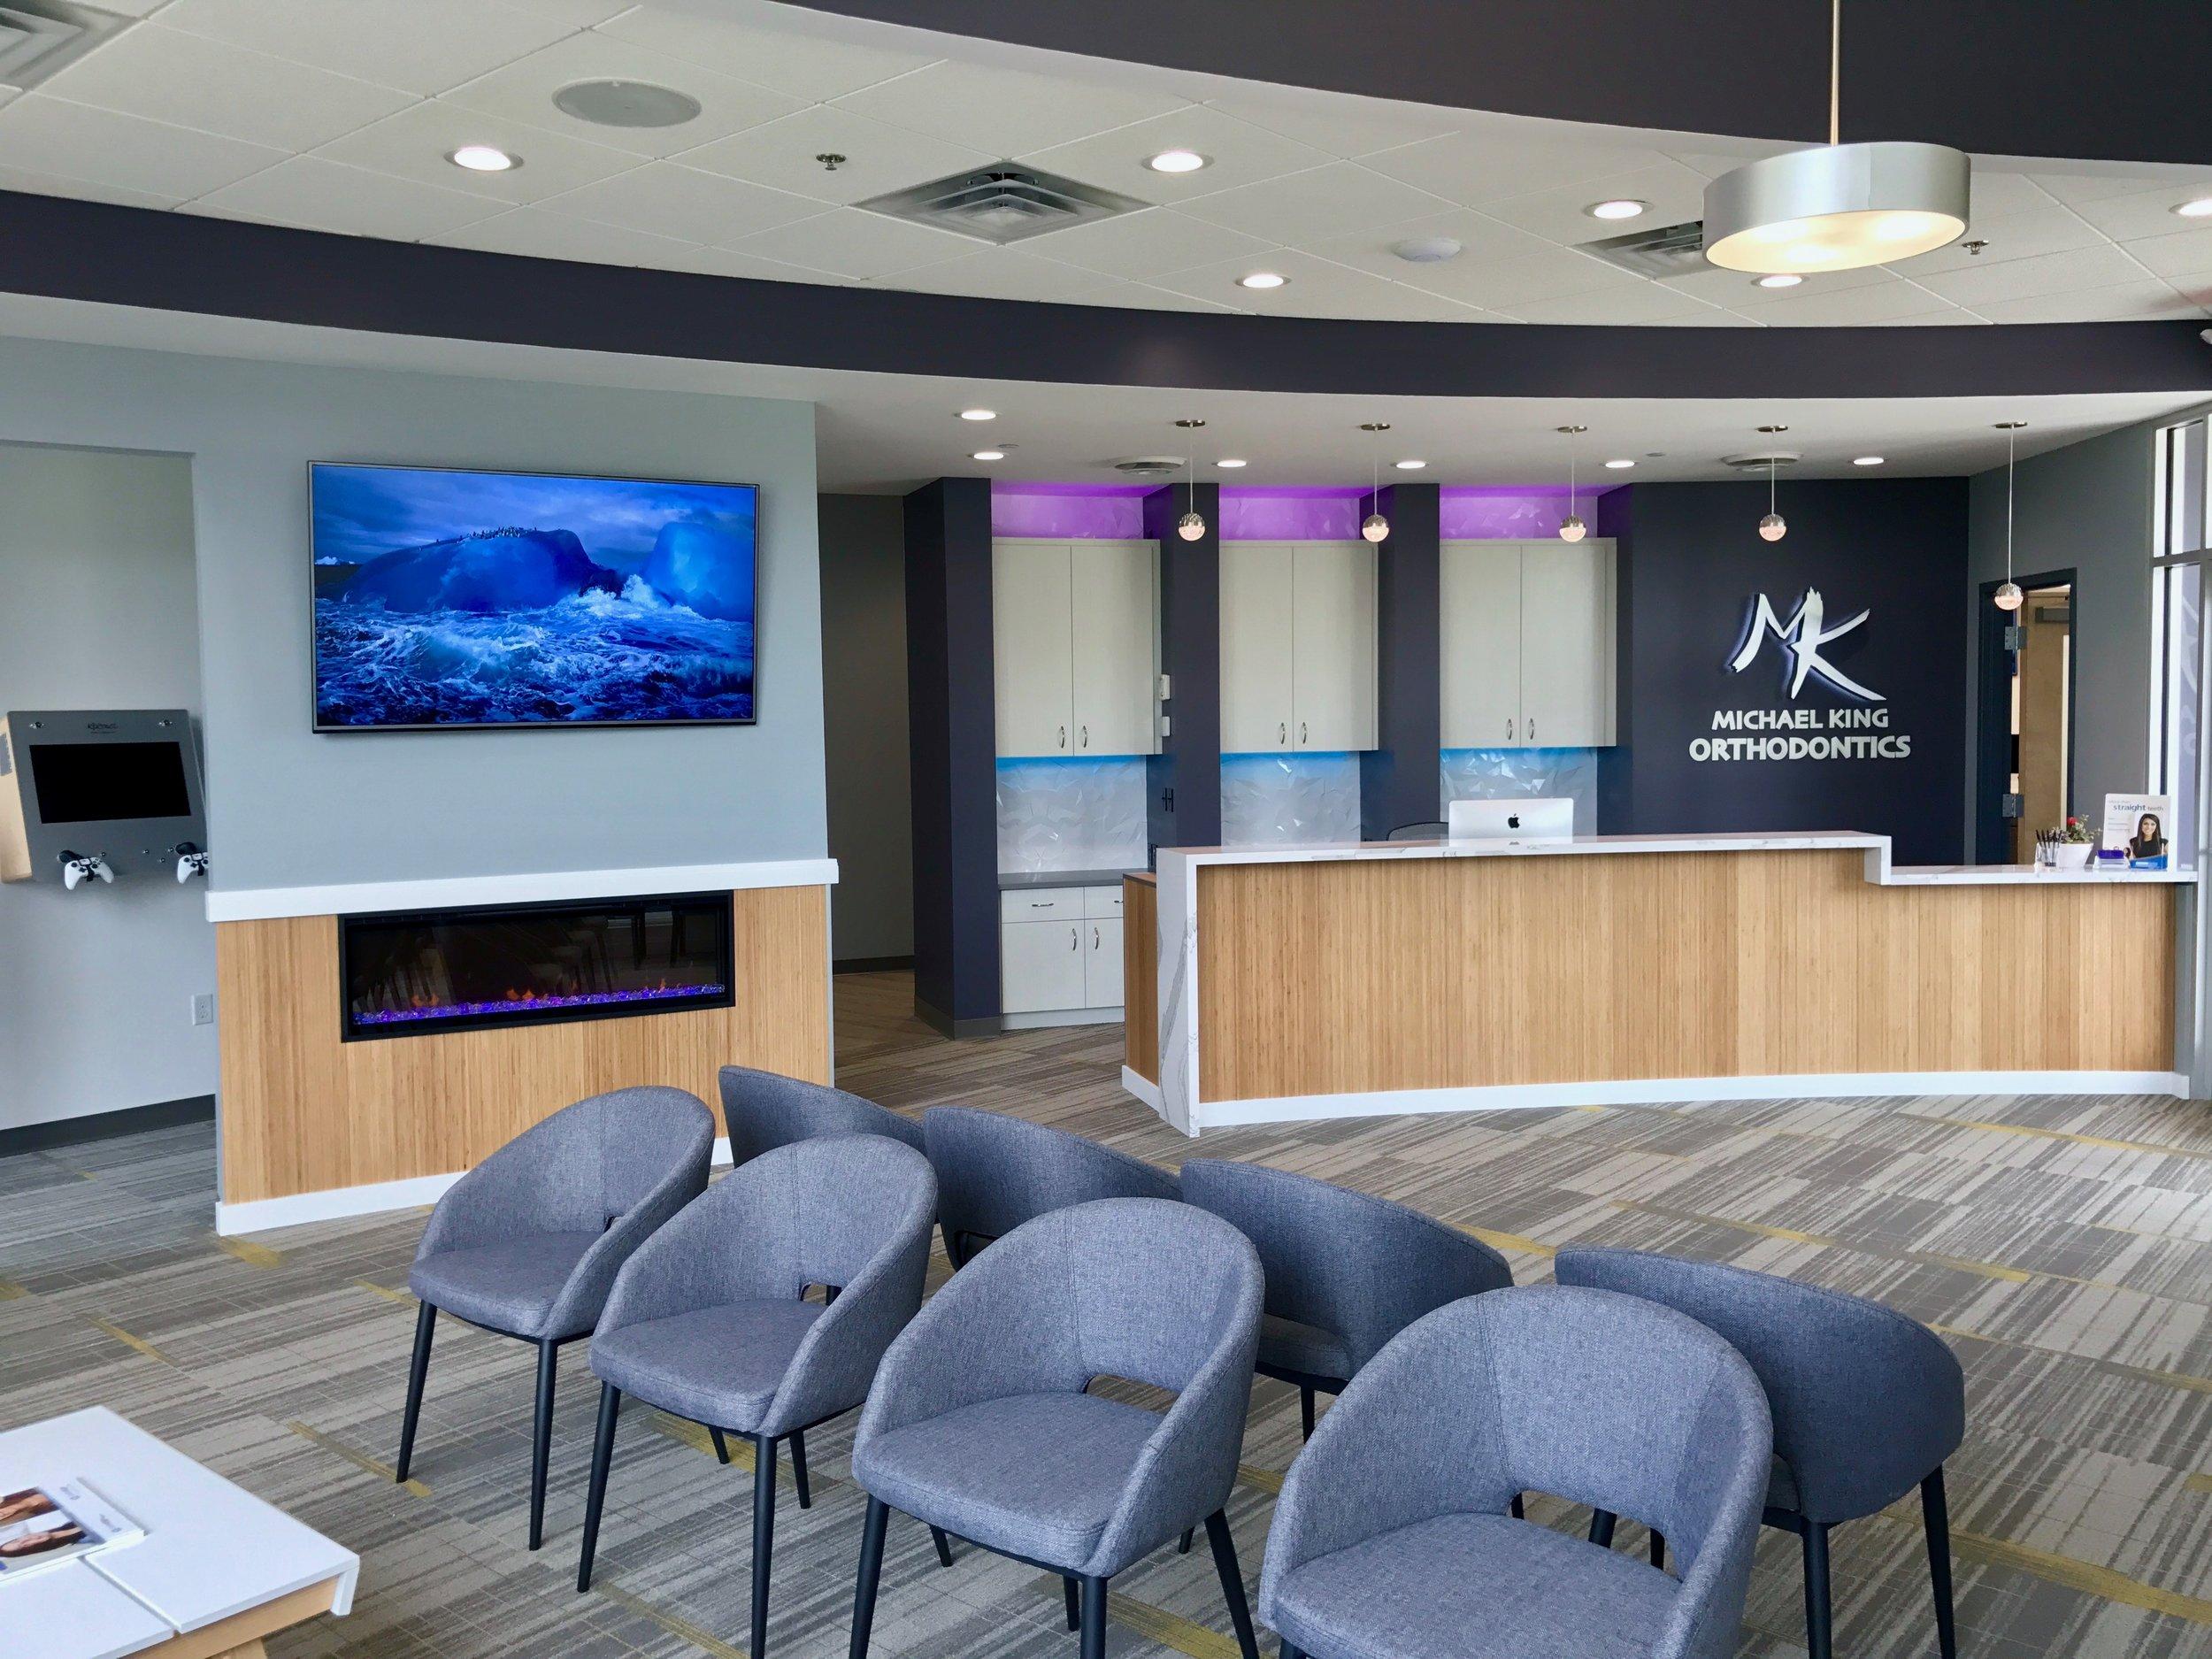 Michael King Orthodontics Interior 1 W.jpg